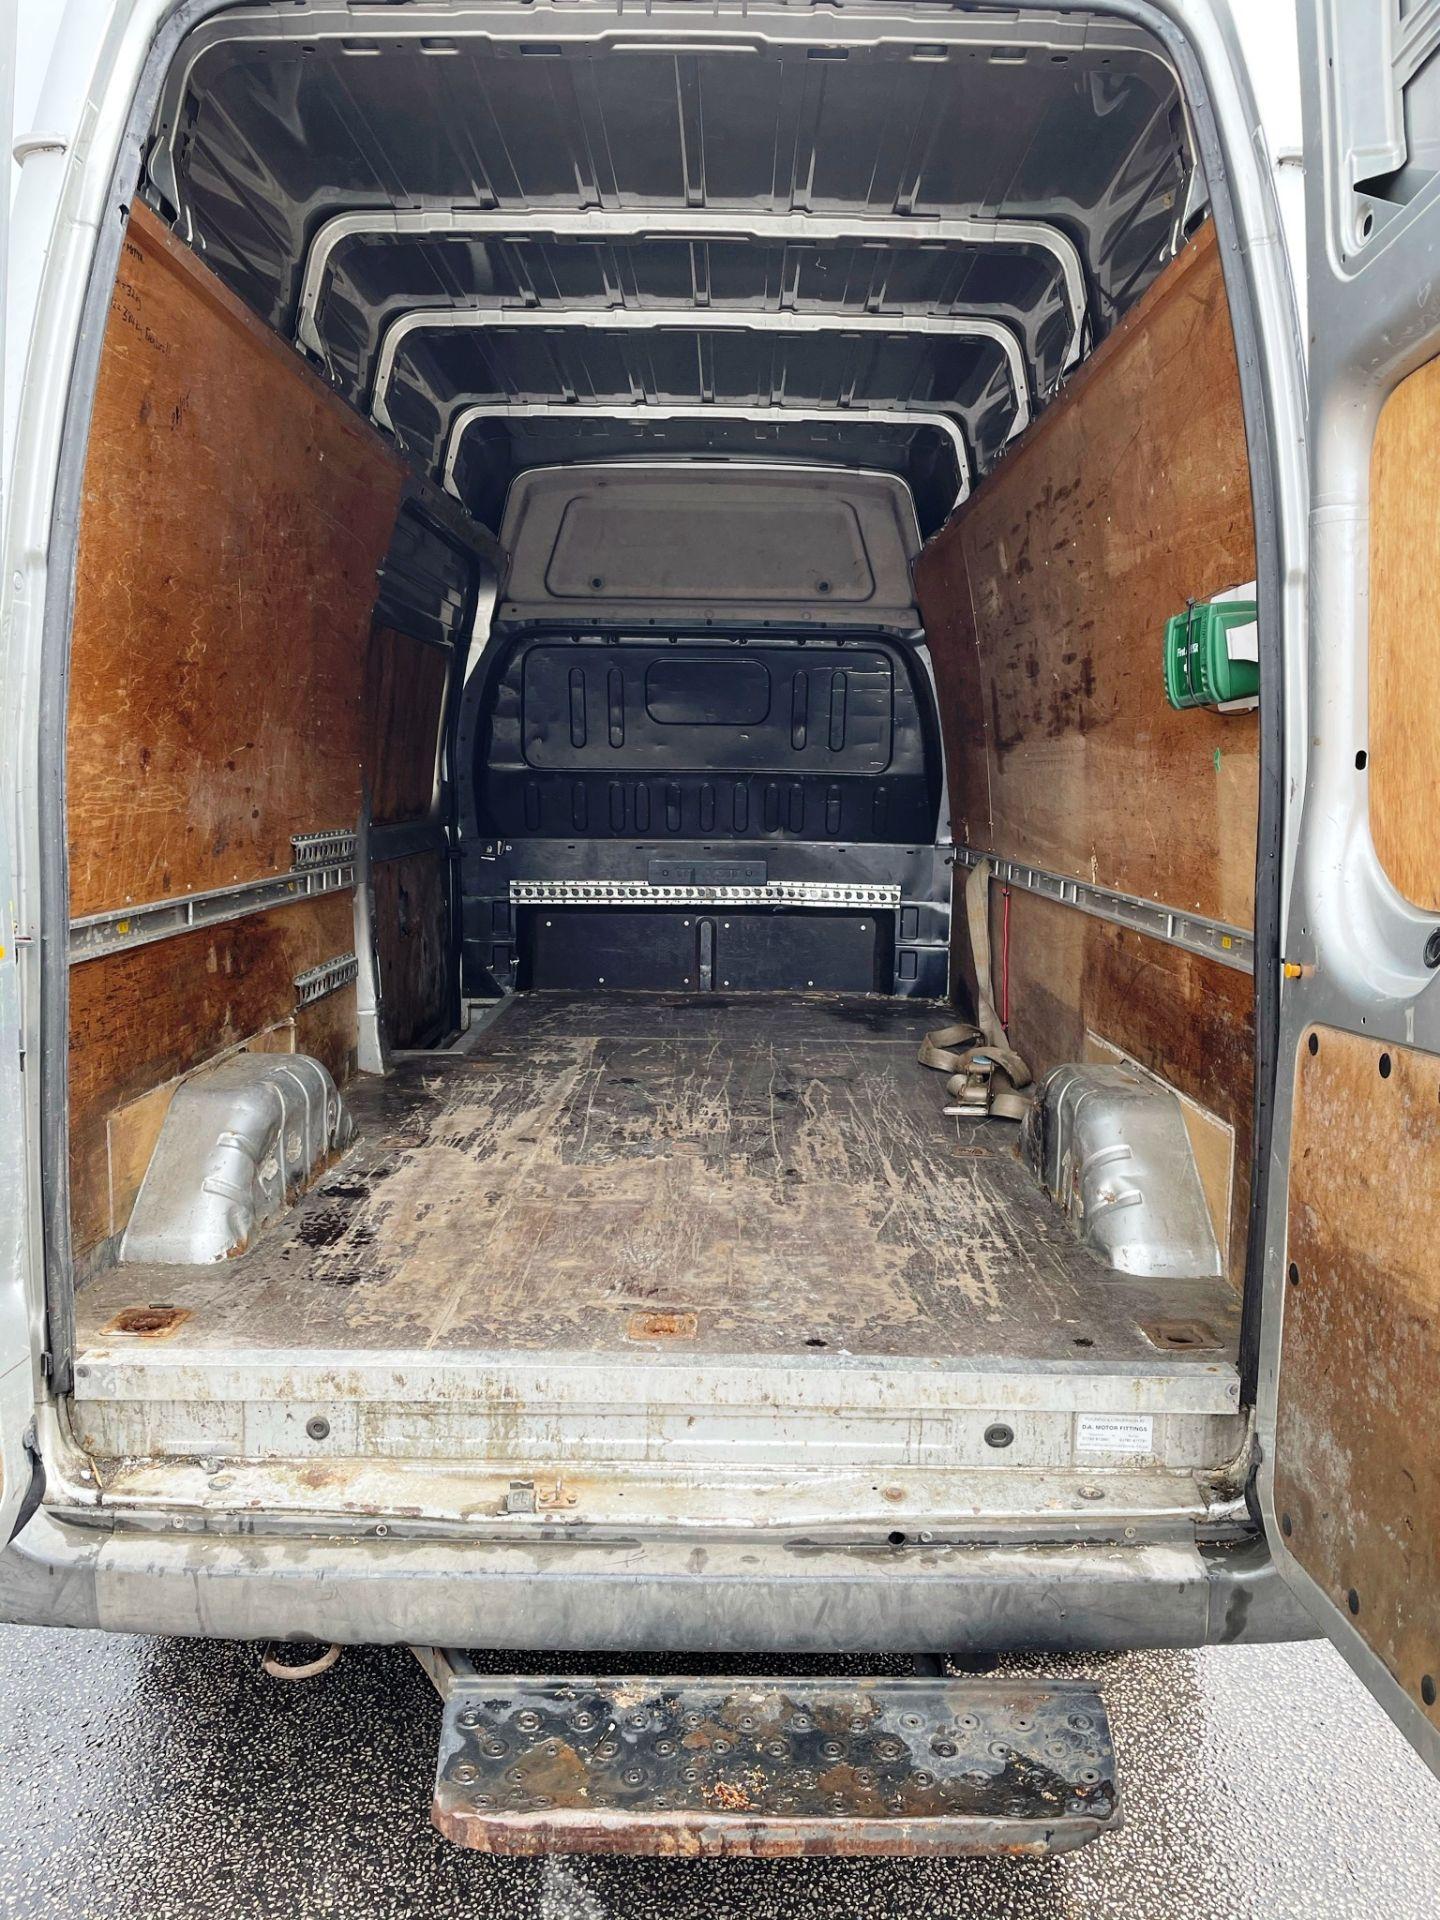 Ford Transit 350 LWB Panel Van   05 Plate  168,443 Miles - Image 16 of 22